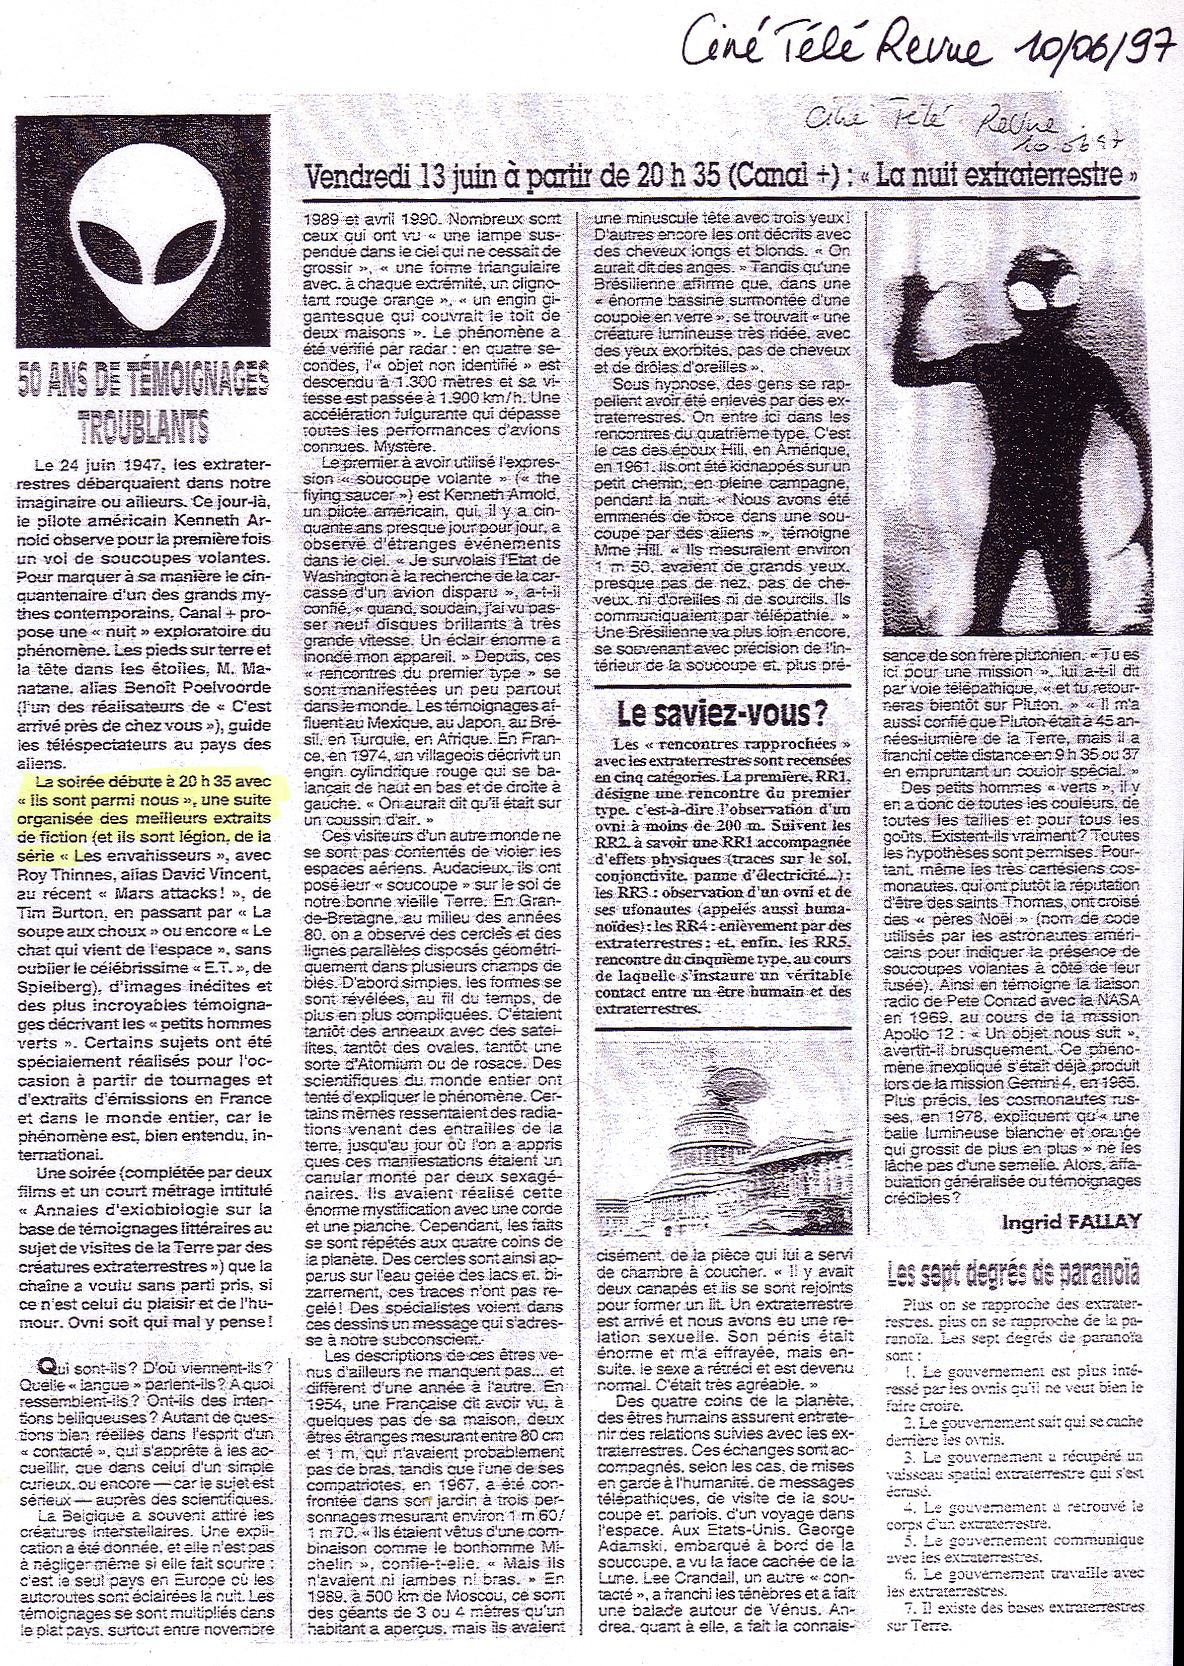 press-1997-006